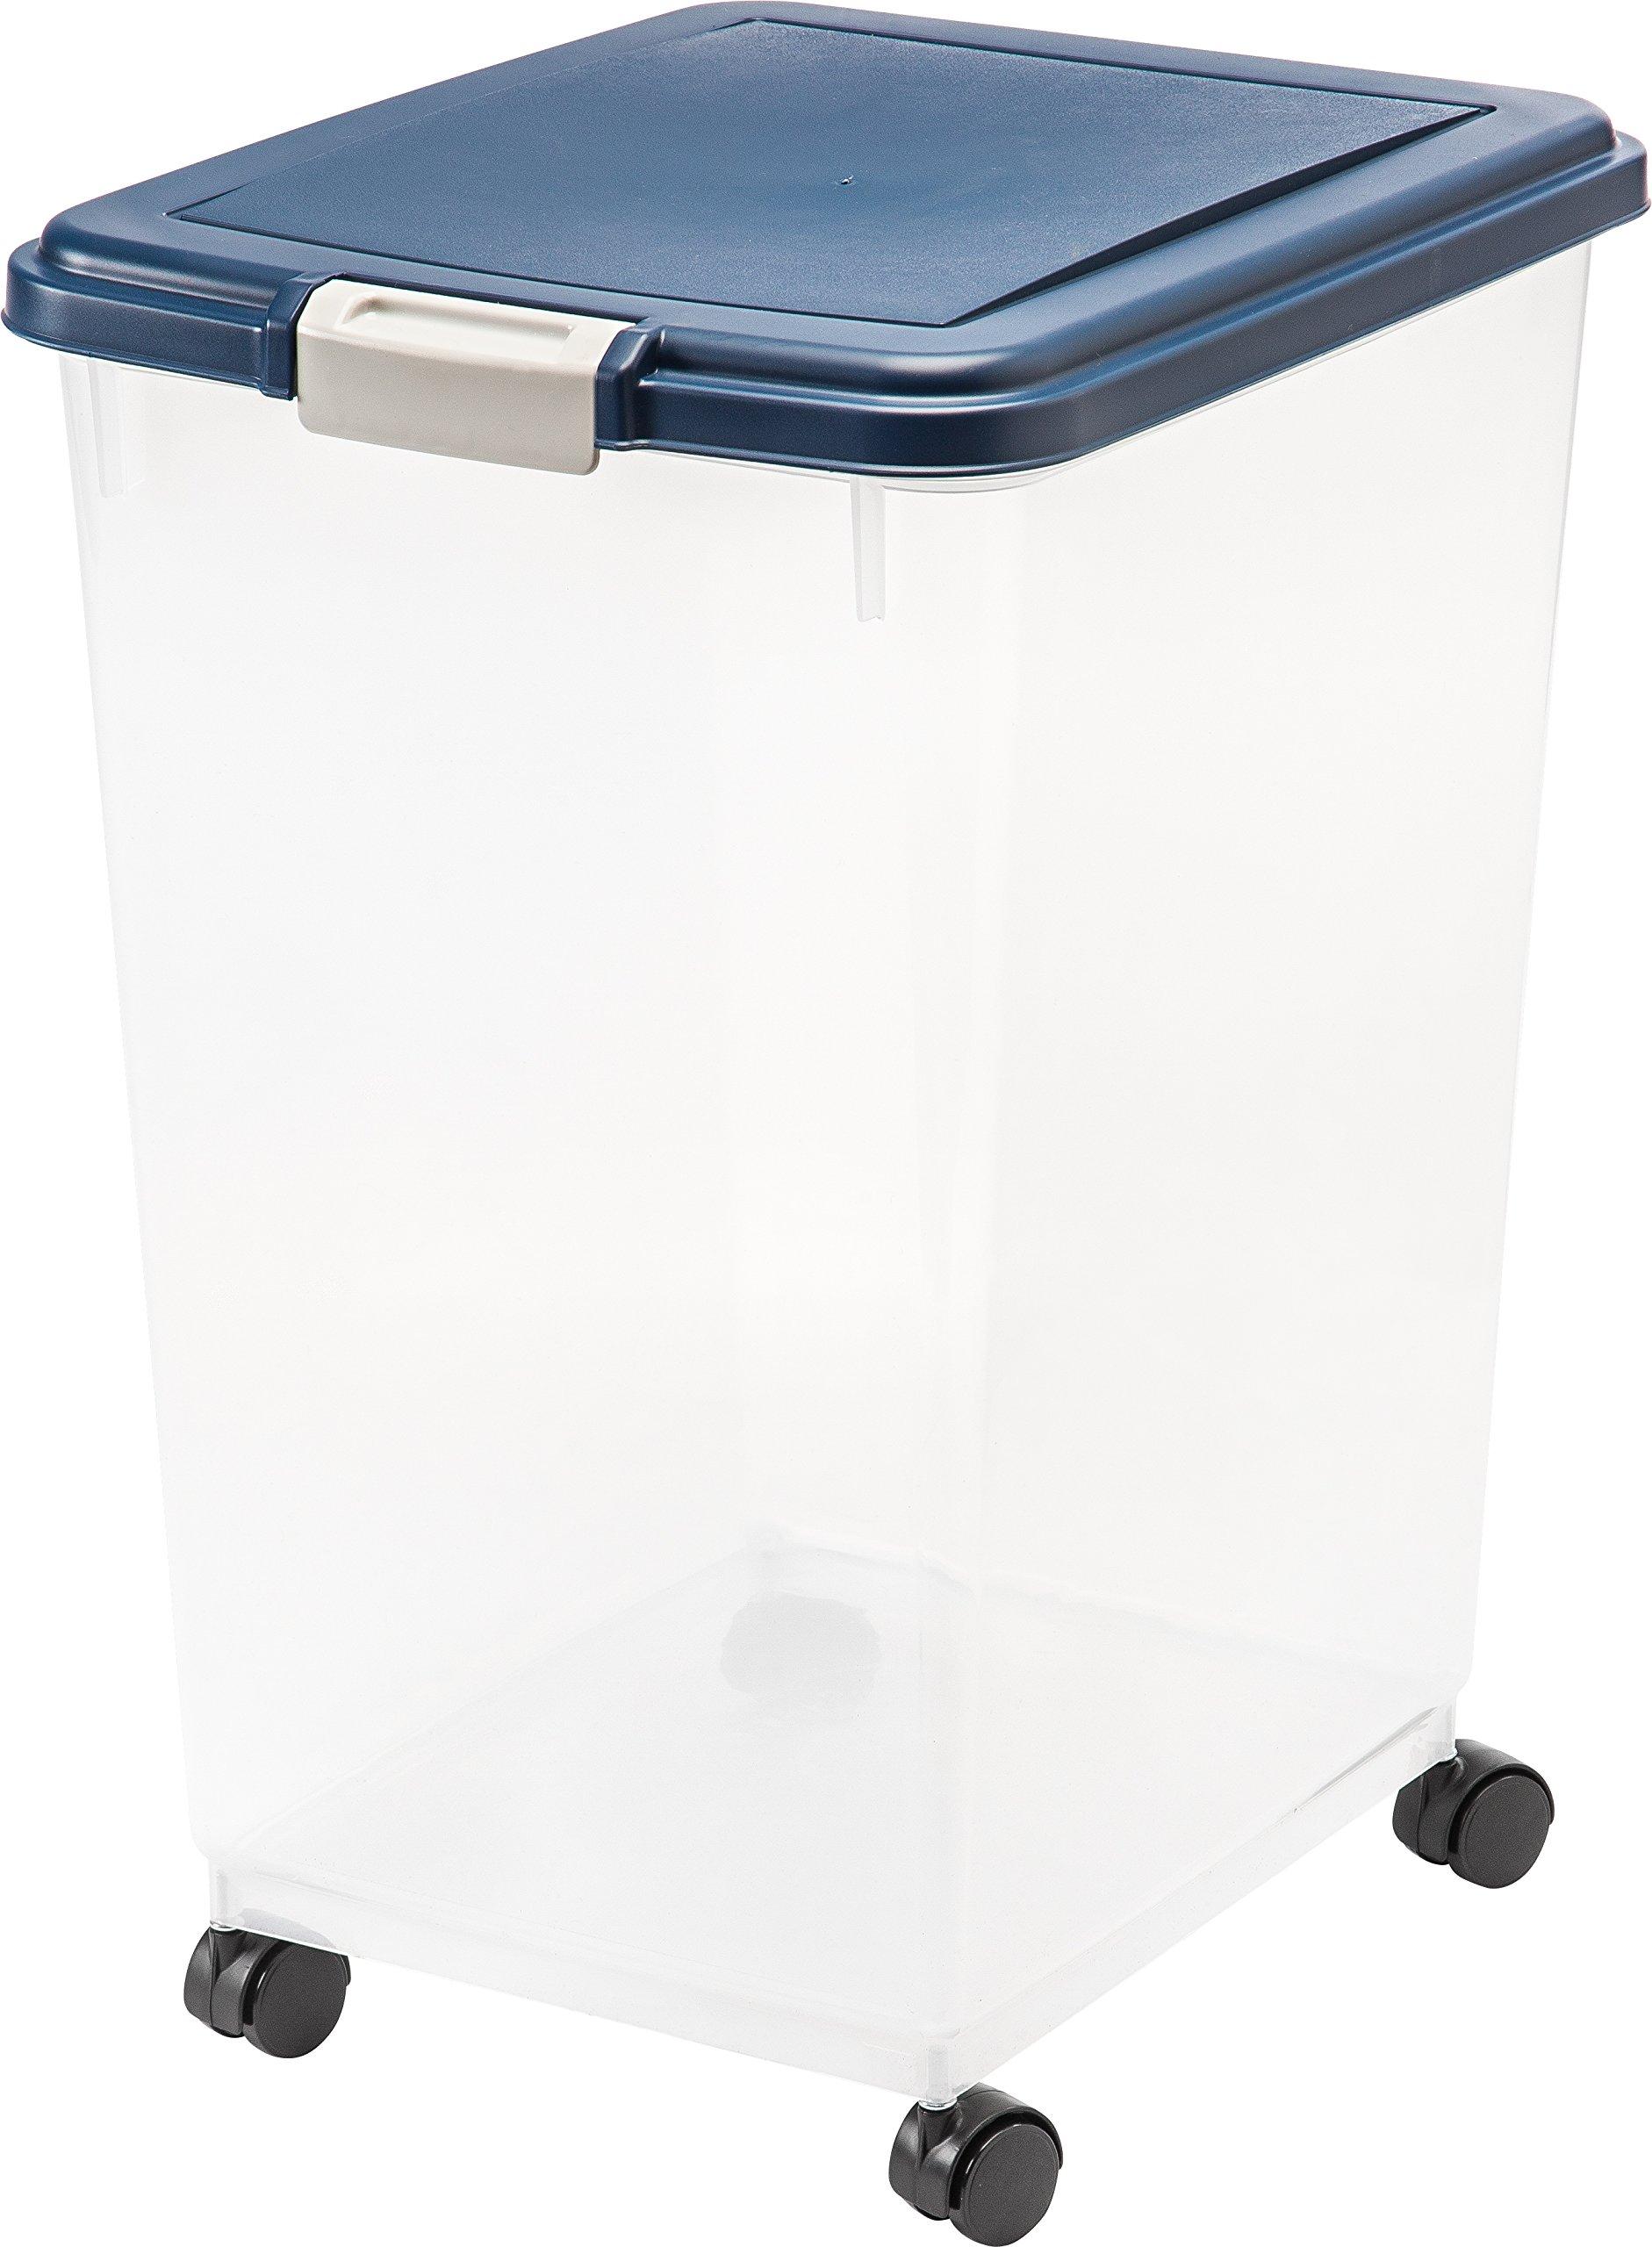 IRIS Airtight Food Storage Container 69-qt